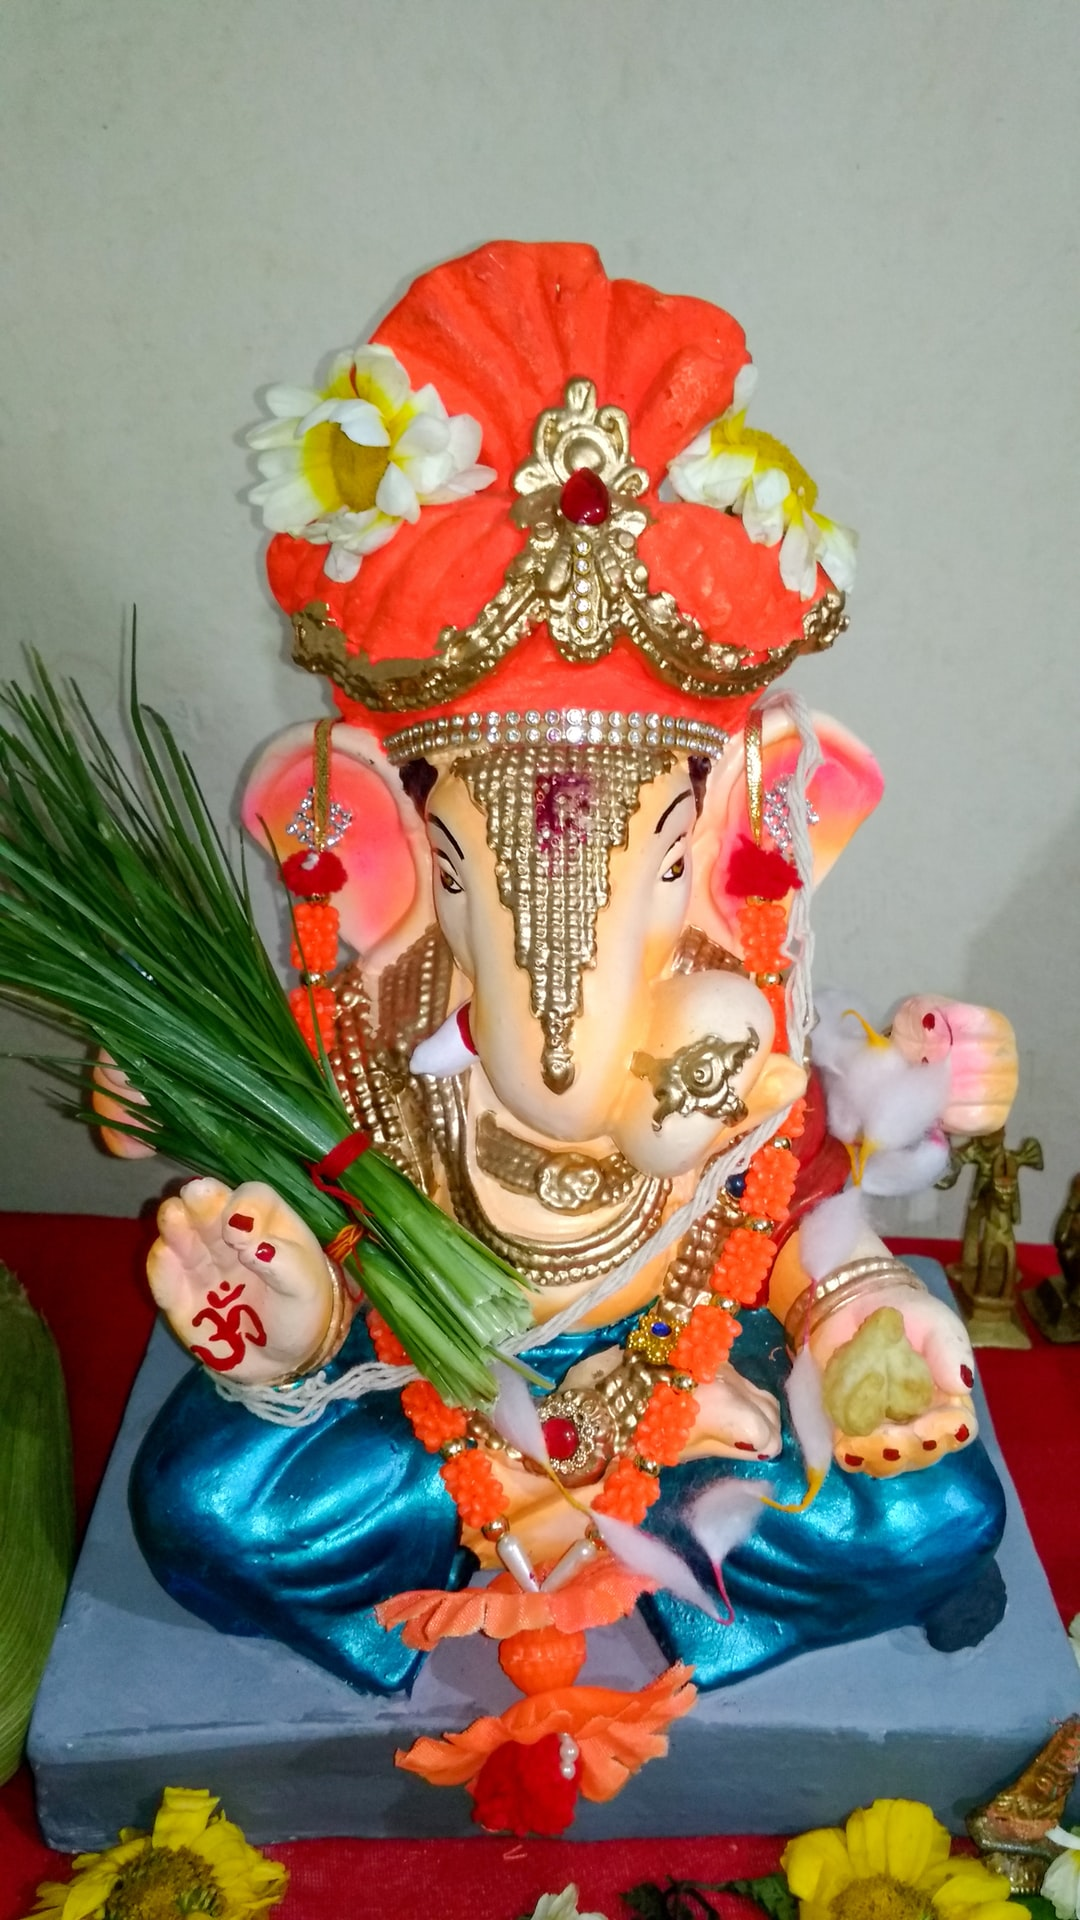 Ganpati Bappa Moriya #ganpati #godess #god #temple #pune